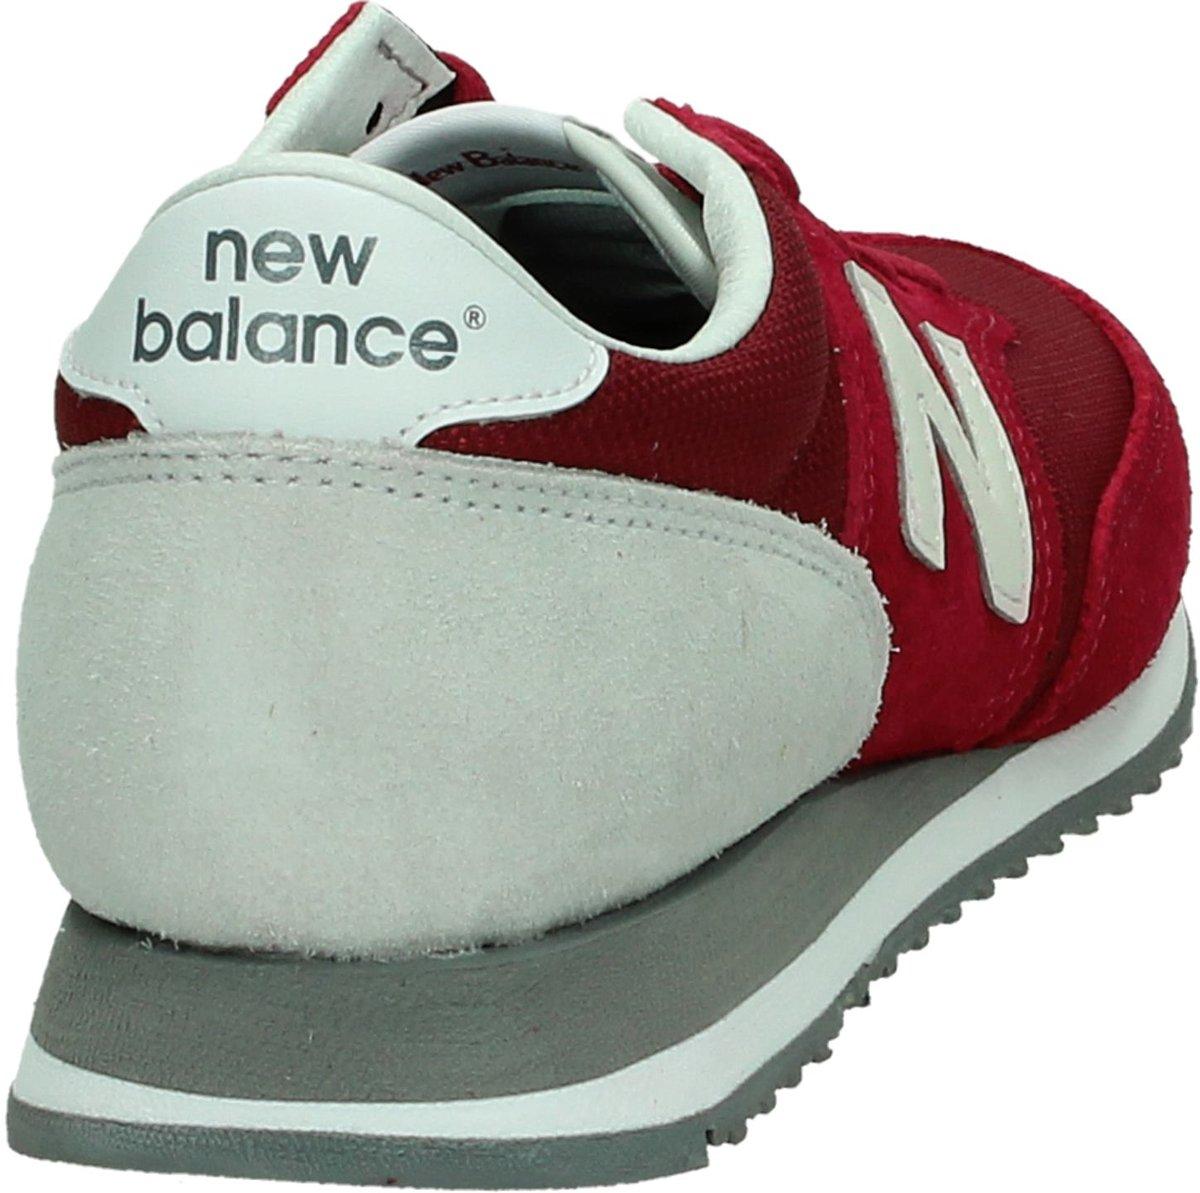 new balance cw620 rood